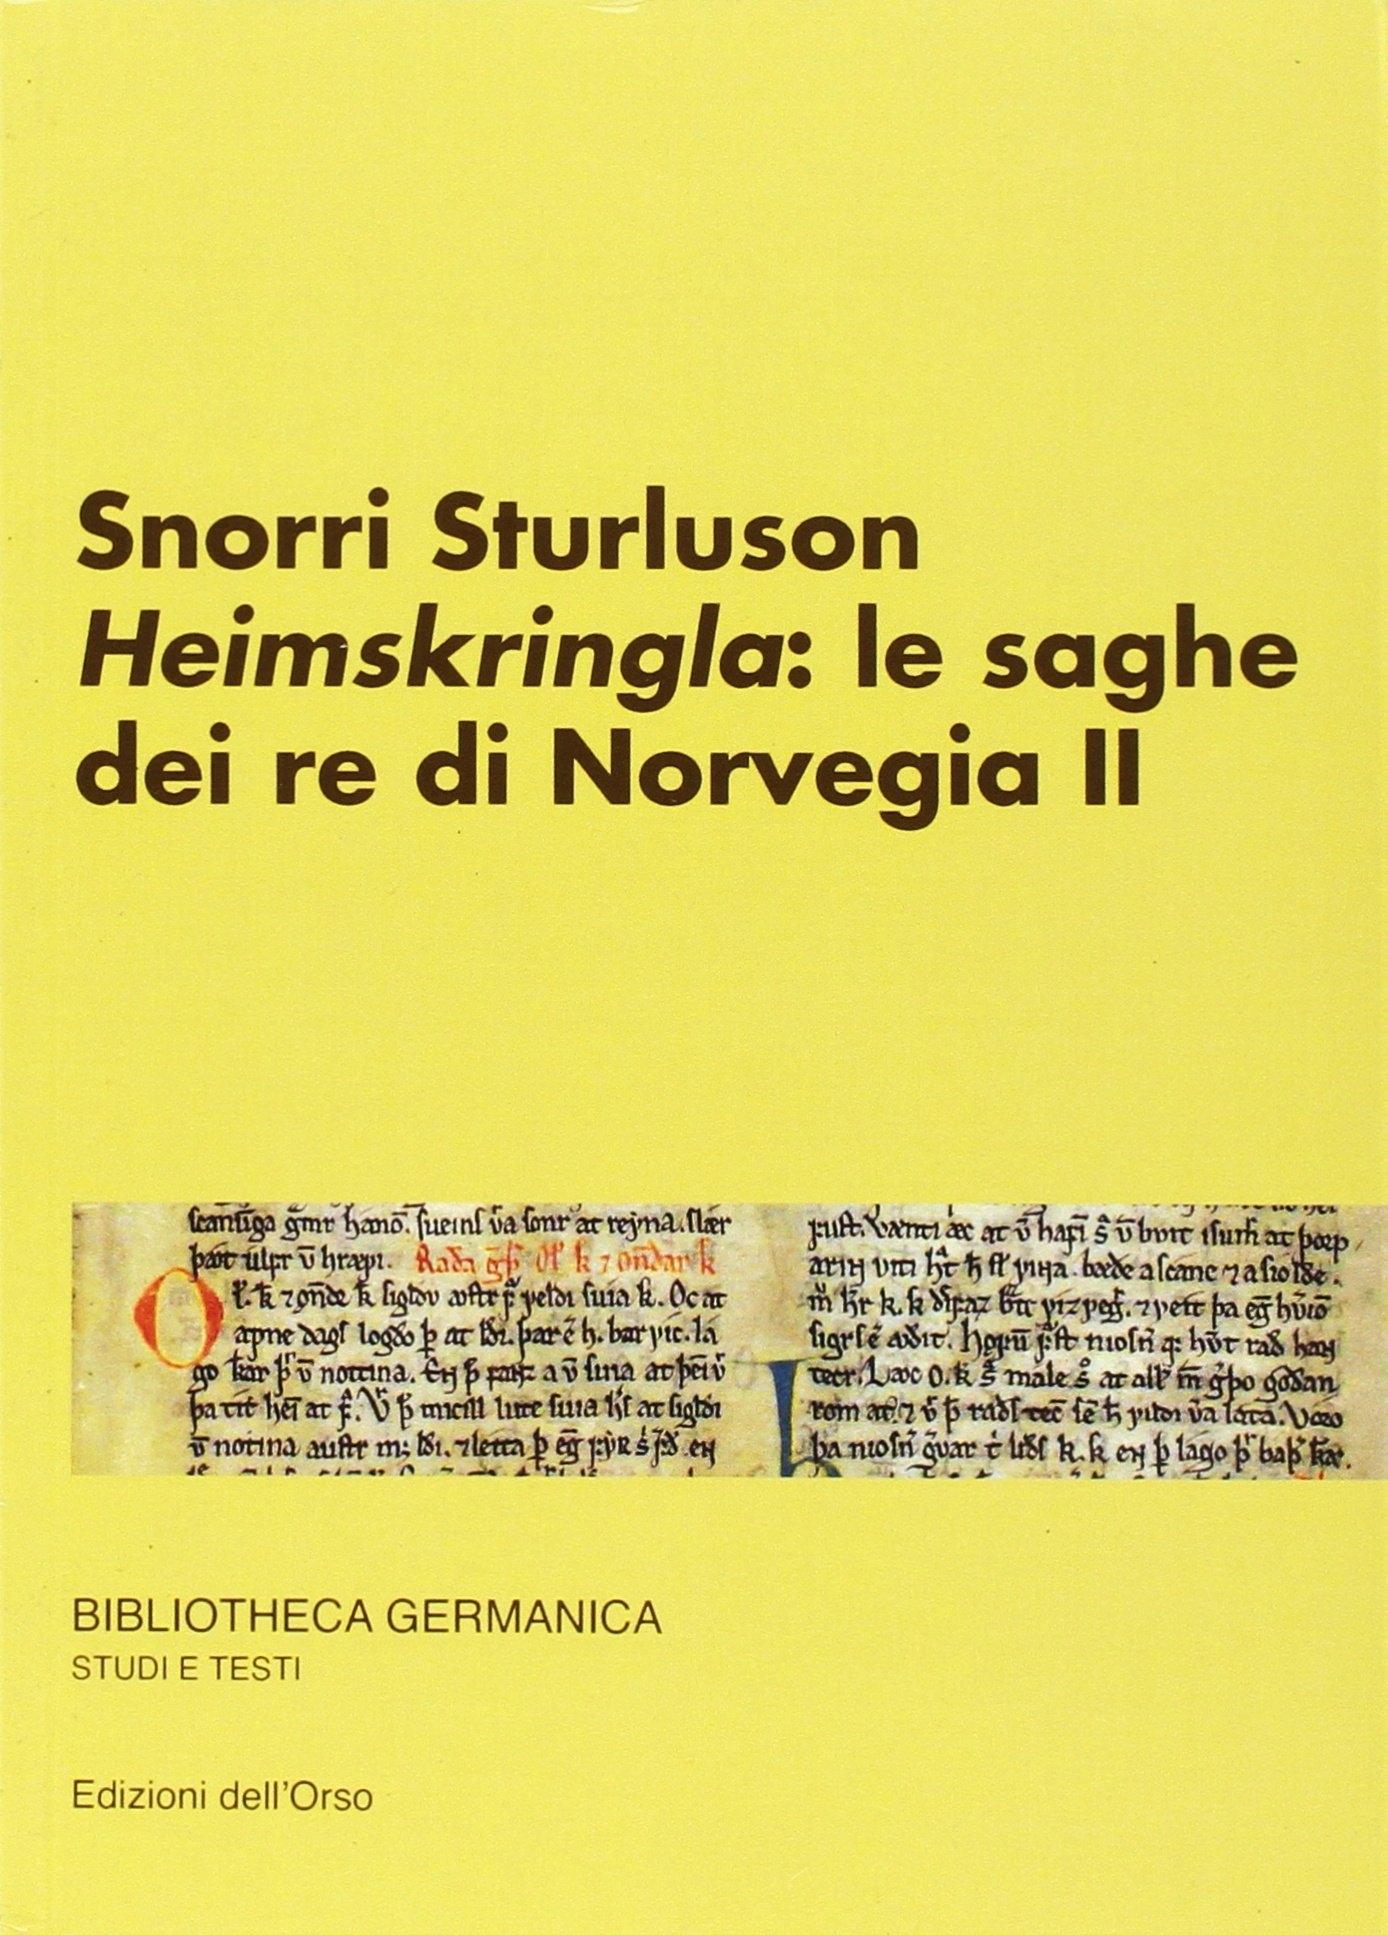 Snorri Sturluson. Heimskringla: le saghe dei re di Norvegia. Ediz. multilingue. Vol. 2